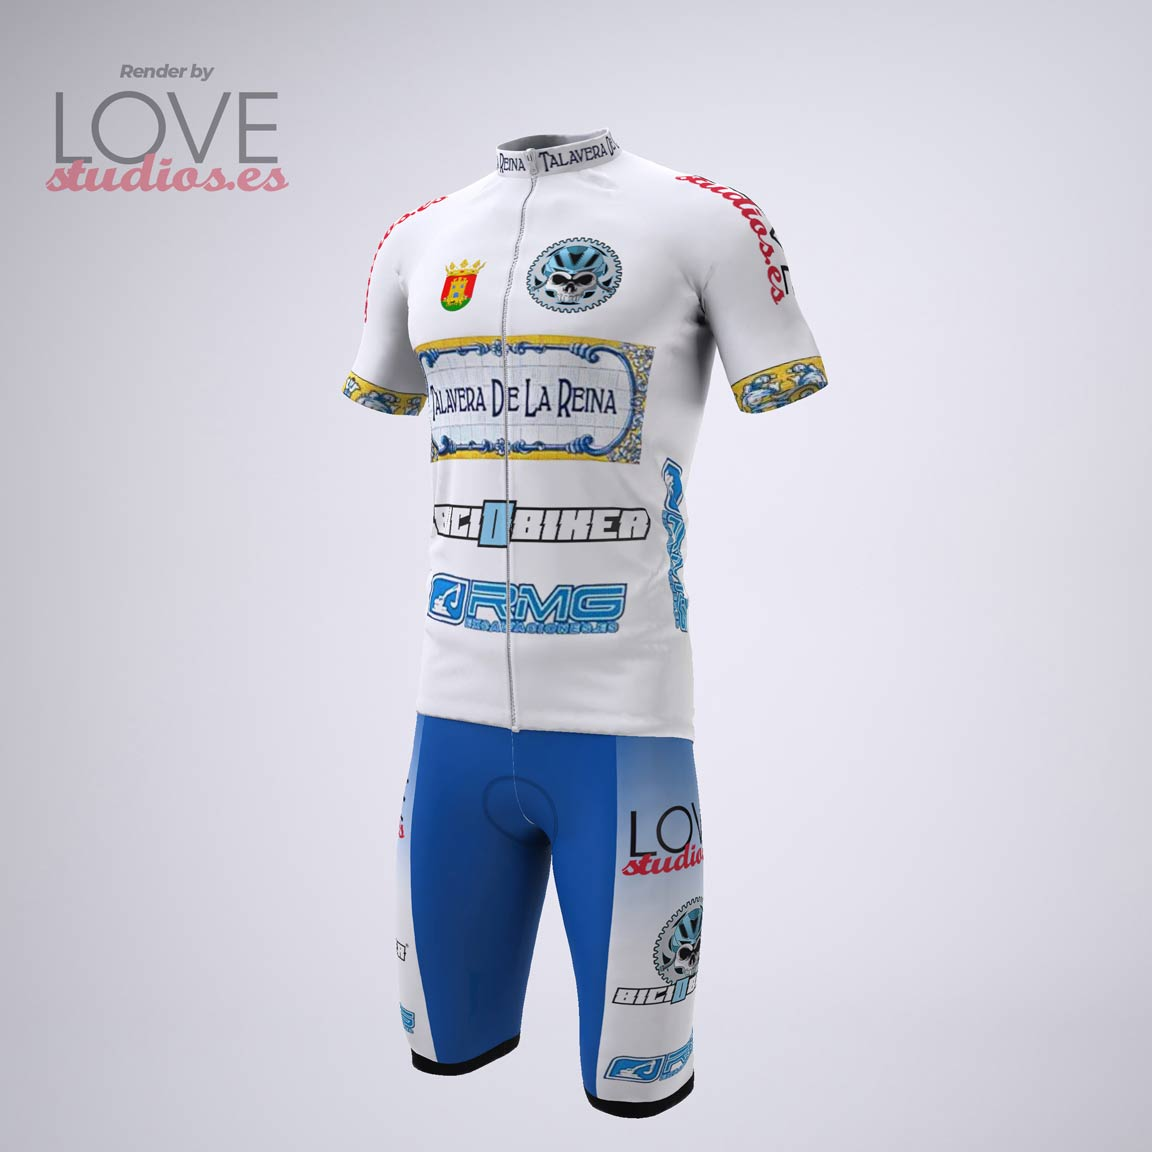 equipo-ciclista-talavera-de-la-reina-love-studios-biciobiker-rmg-2021